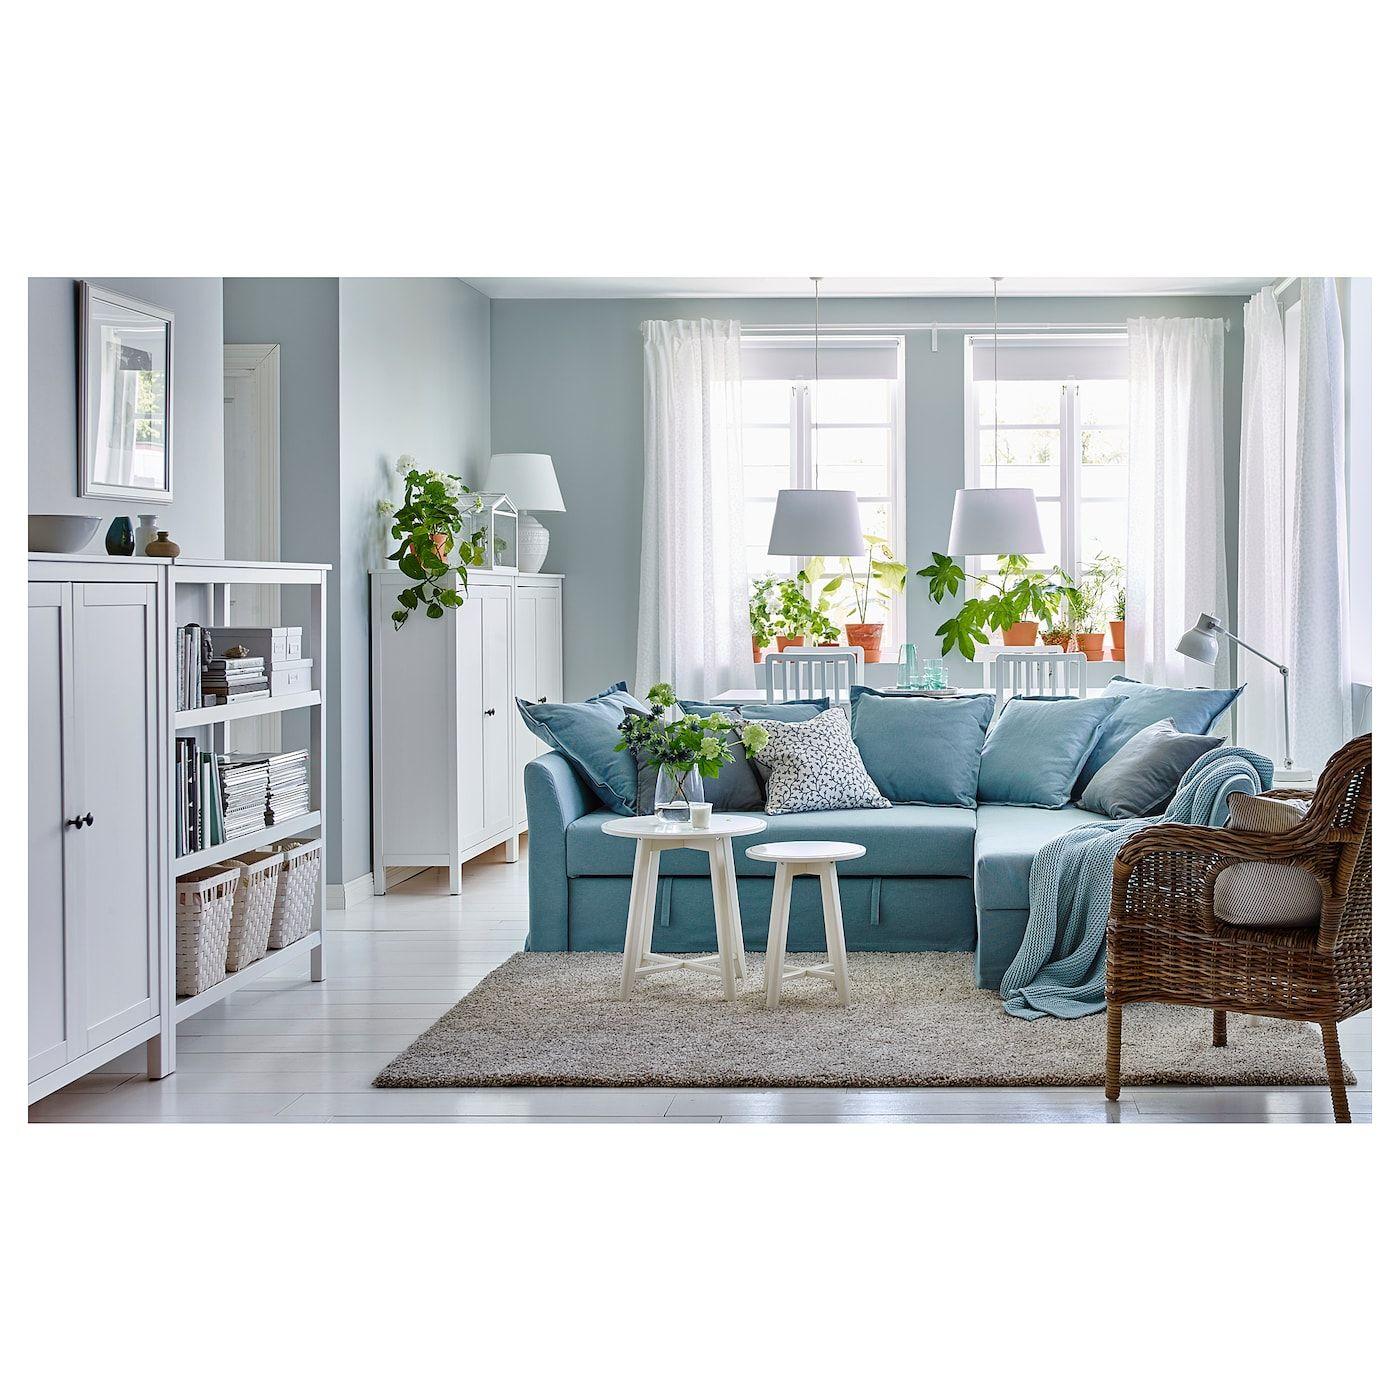 Holmsund Sleeper Sectional 3 Seat Orrsta Light Blue Ikea Blue Living Room Decor Light Blue Couch Living Room Light Blue Sofa